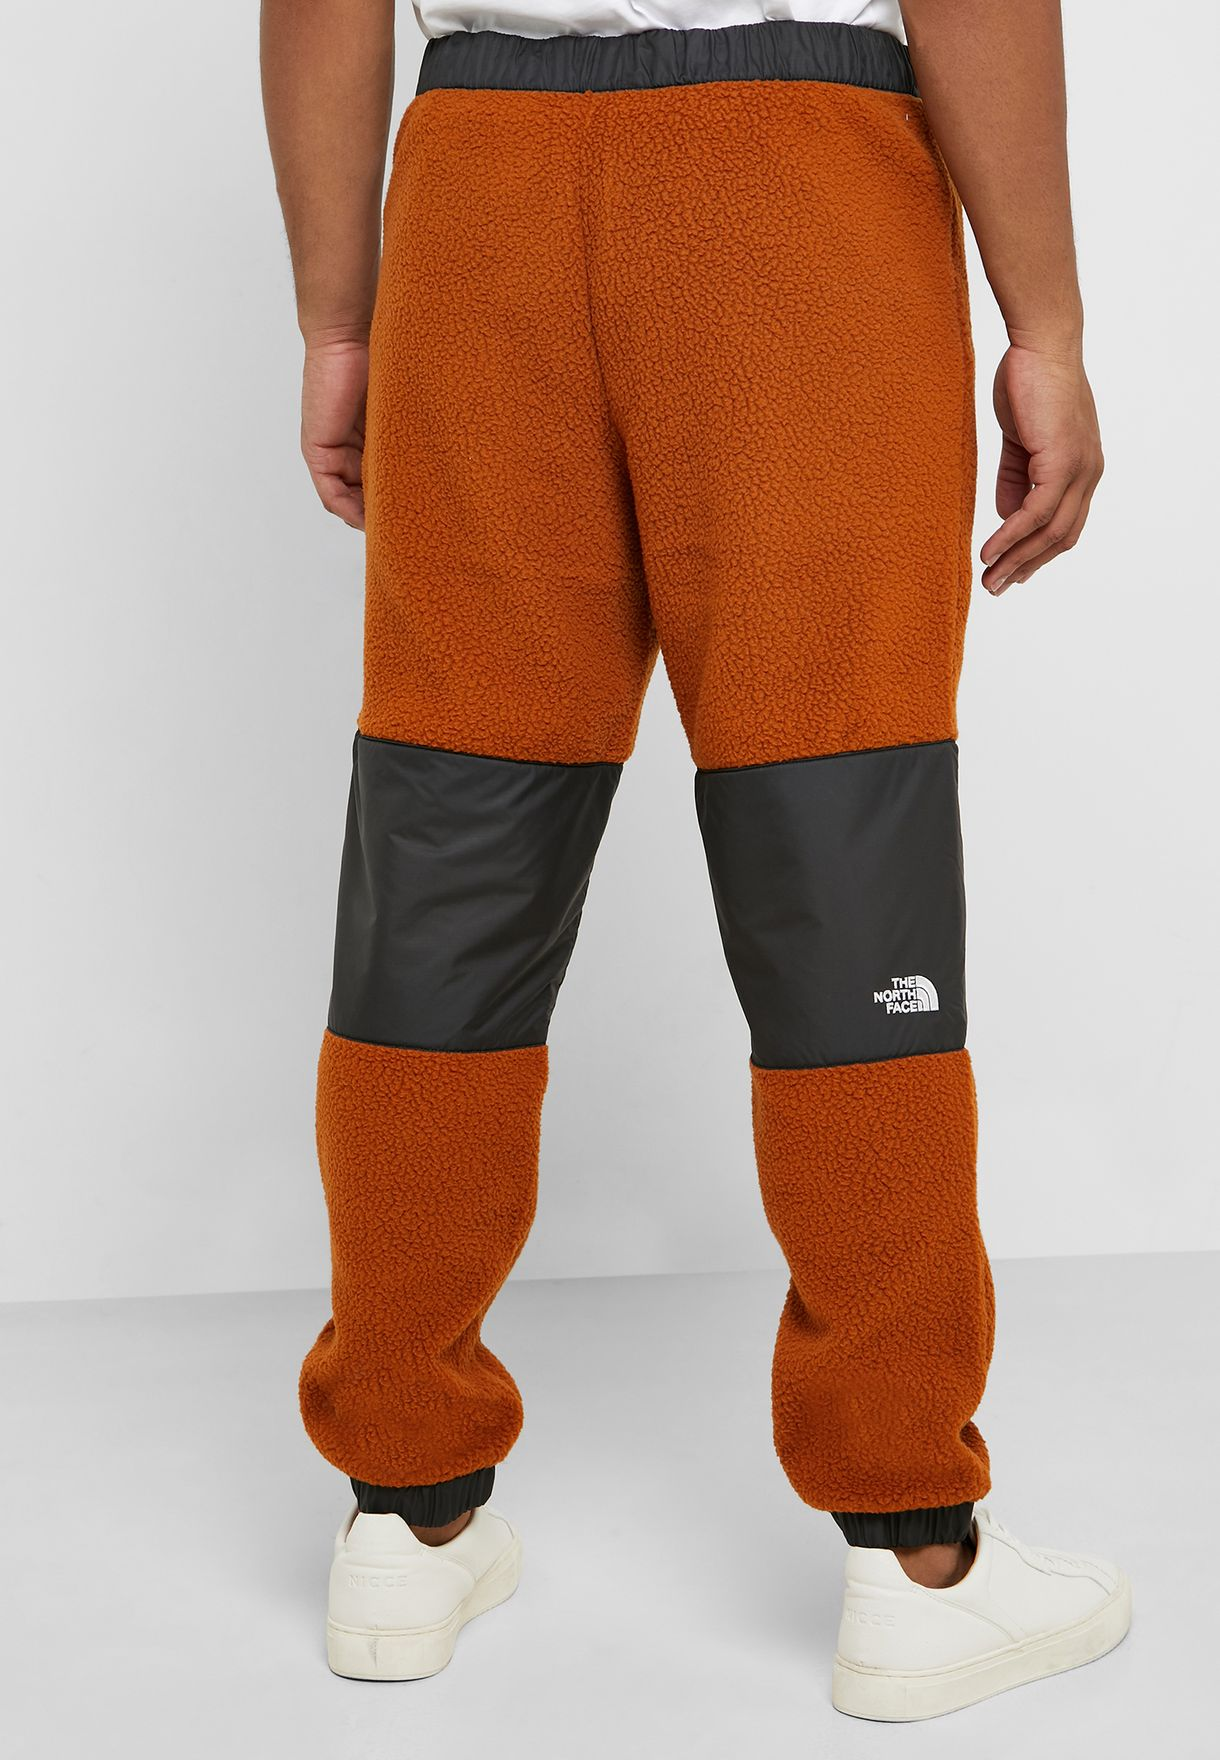 Denali Sweatpants